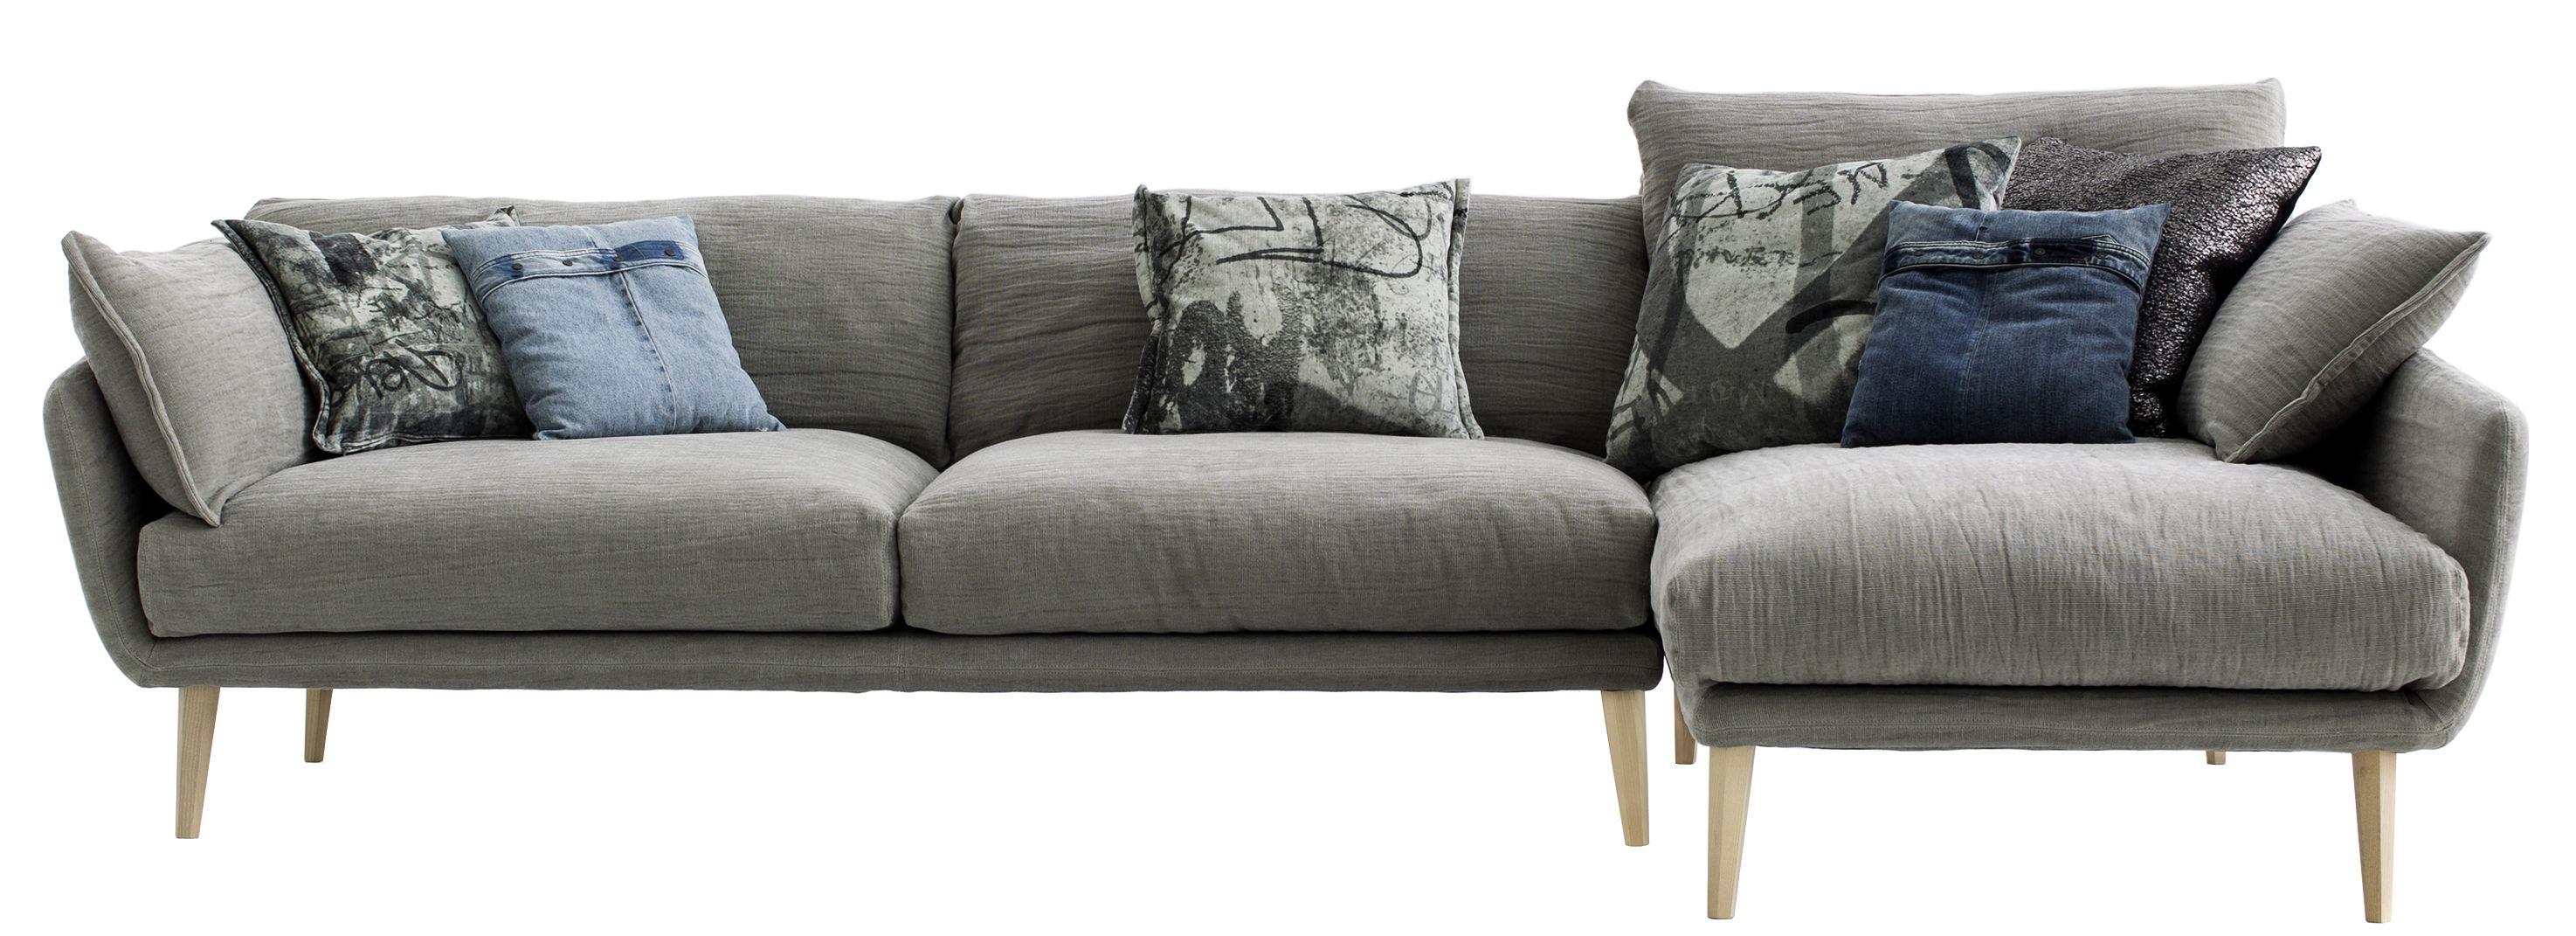 canap d 39 angle sister ray l 267 cm compo canap 2 places m ridienne gris pieds bois. Black Bedroom Furniture Sets. Home Design Ideas